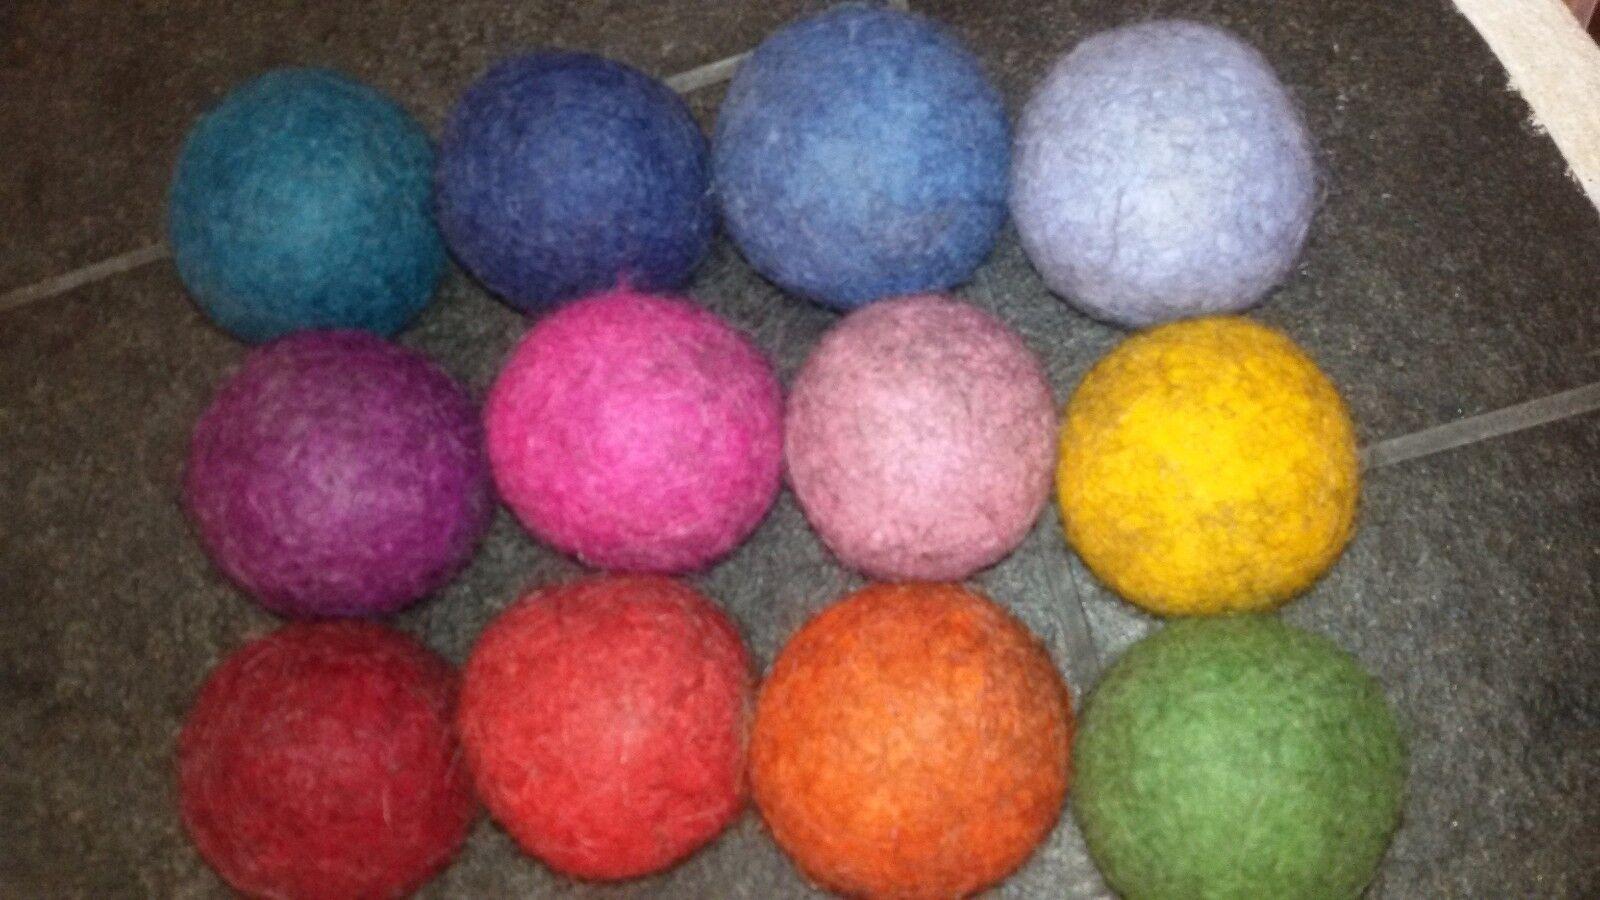 Hundespielzeug Voll Filz Ball Tennisball-Größe, sehr robust Wolle